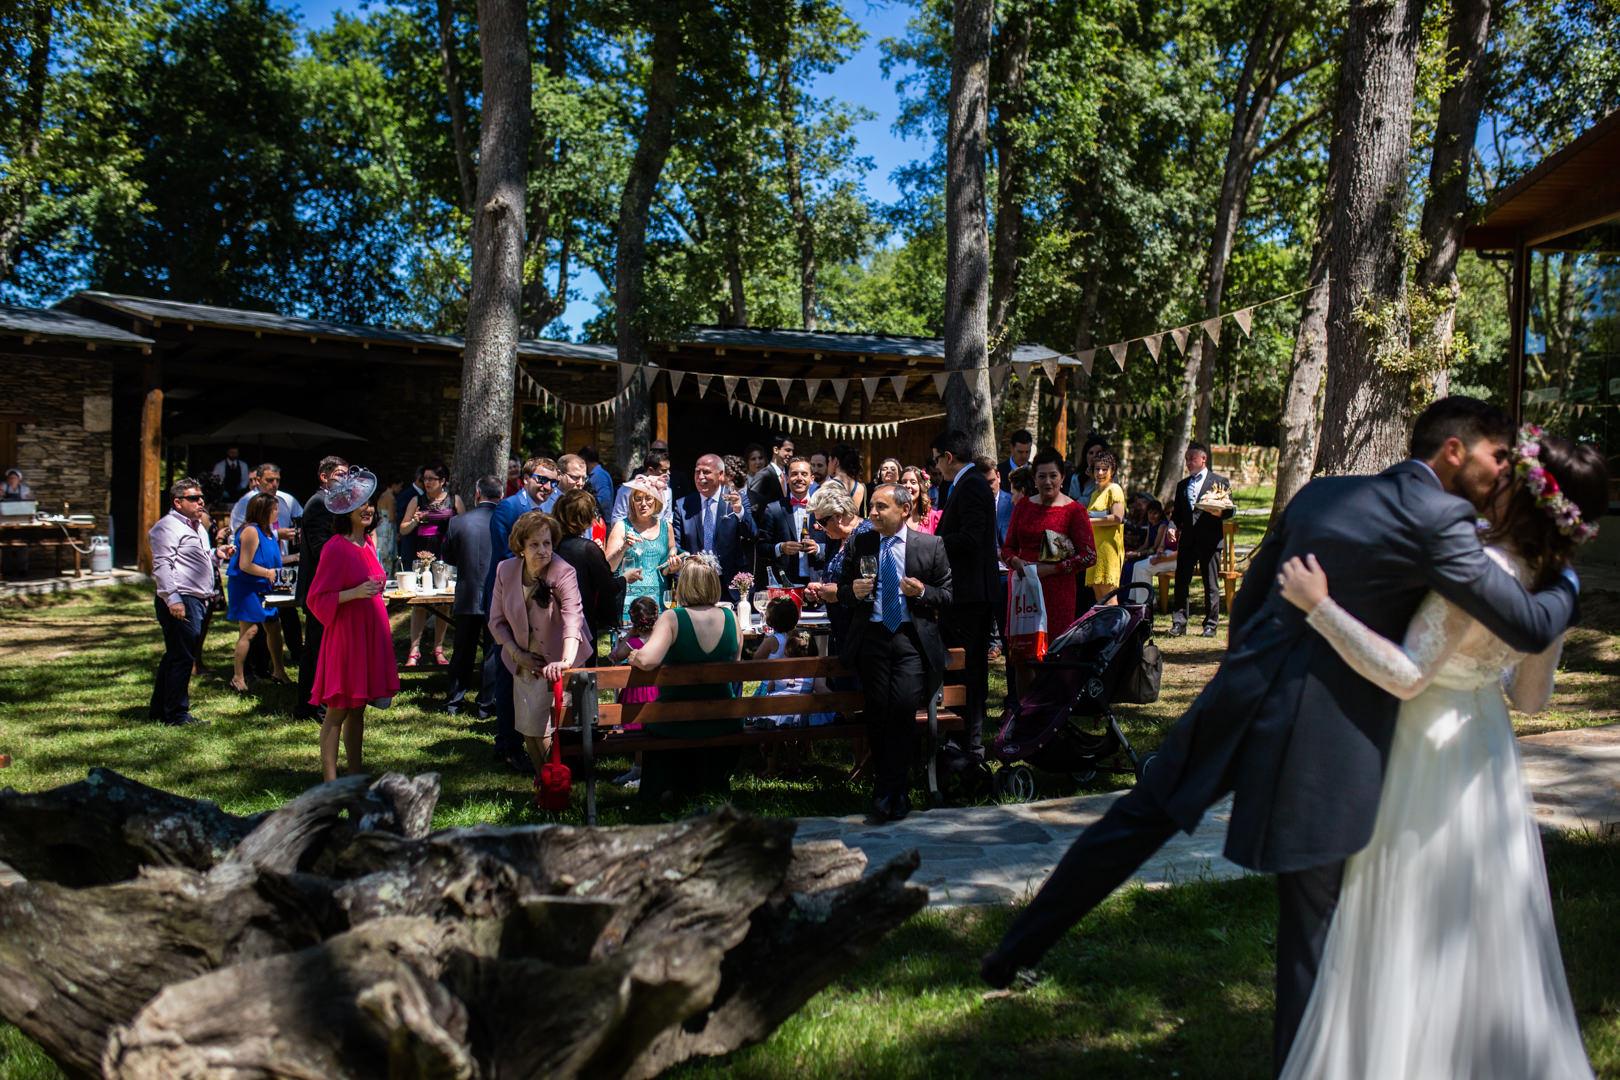 Boda-Lucia-Javi-Lugo-Rafael-Torres-fotografo-bodas-sevilla-madrid-barcelona-wedding-photographer--31.jpg